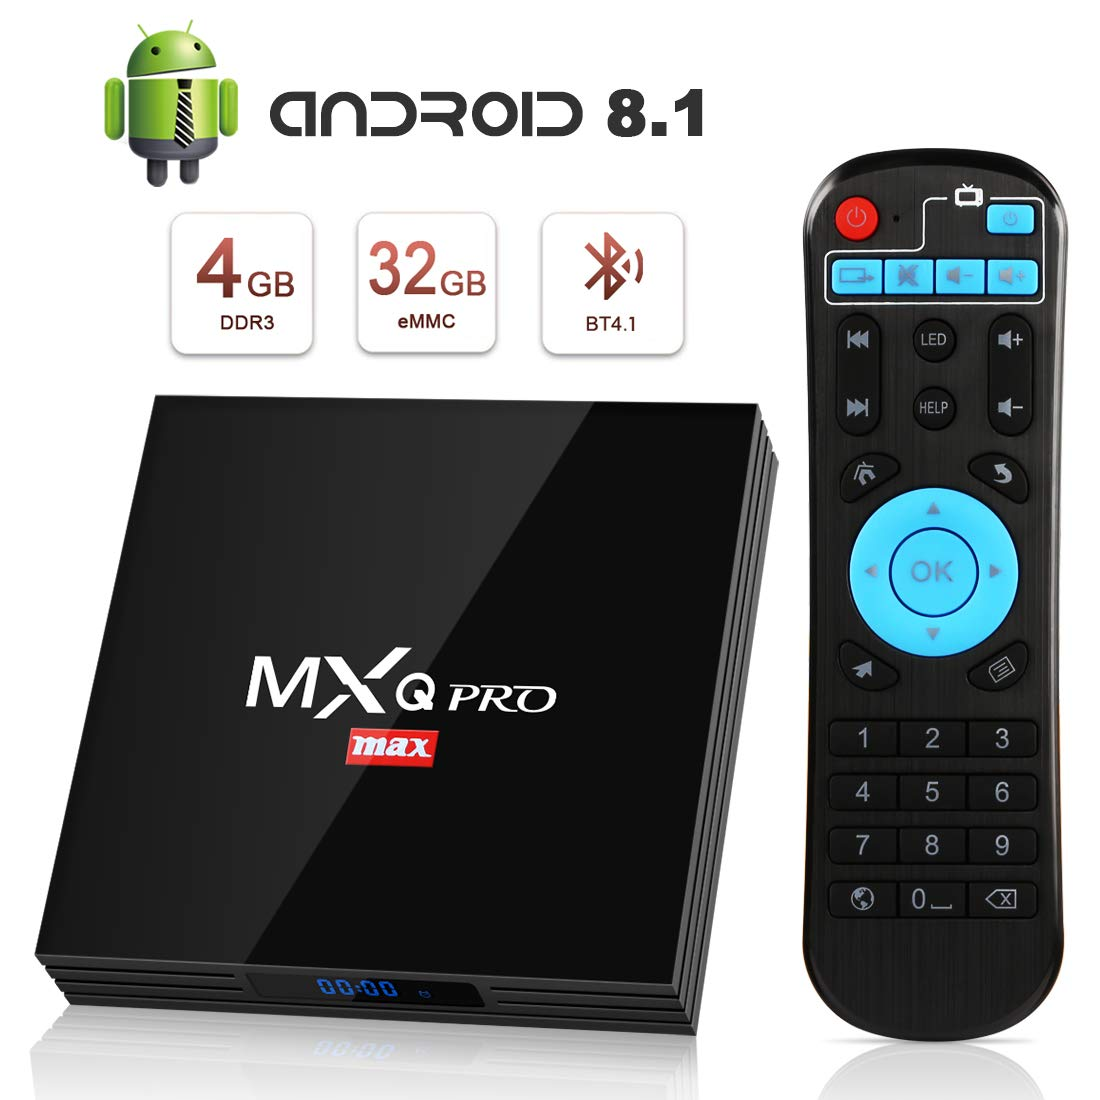 Android 8.1 TV Box, Superpow Smart TV Box Quad Core 4GB RAM+32GB ROM